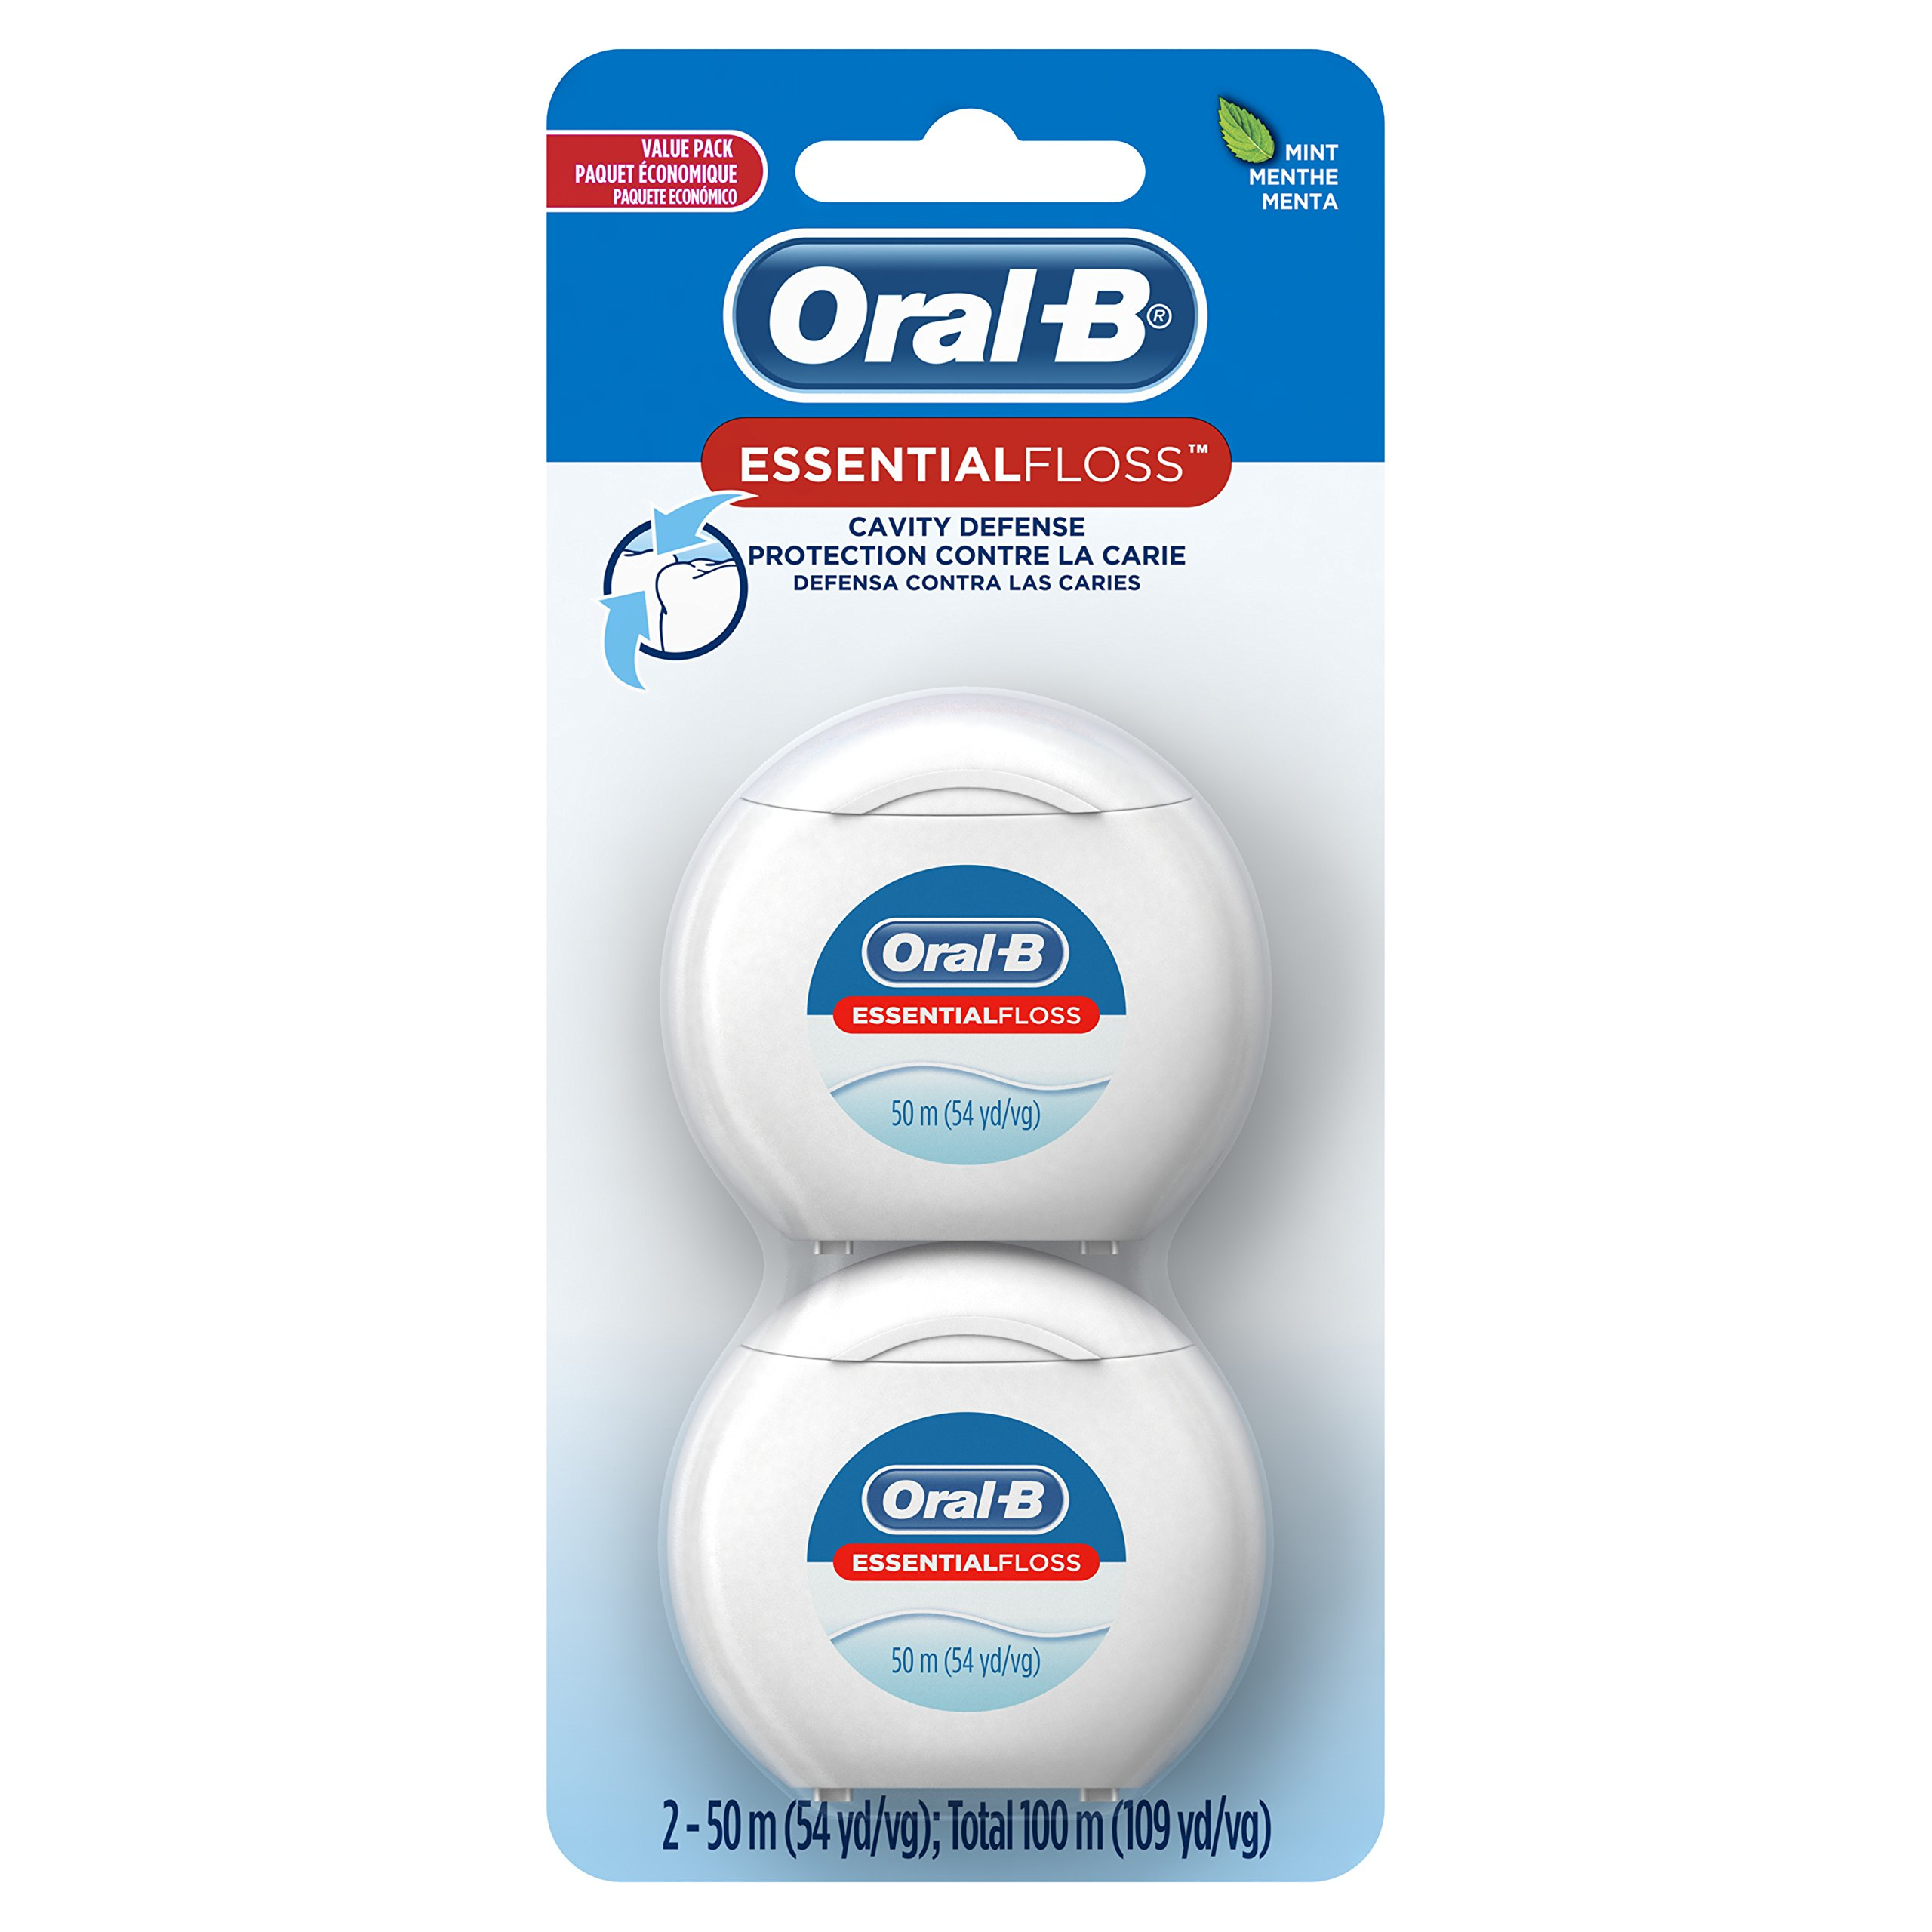 Oral B EssentialFloss Cavity Defense Dental